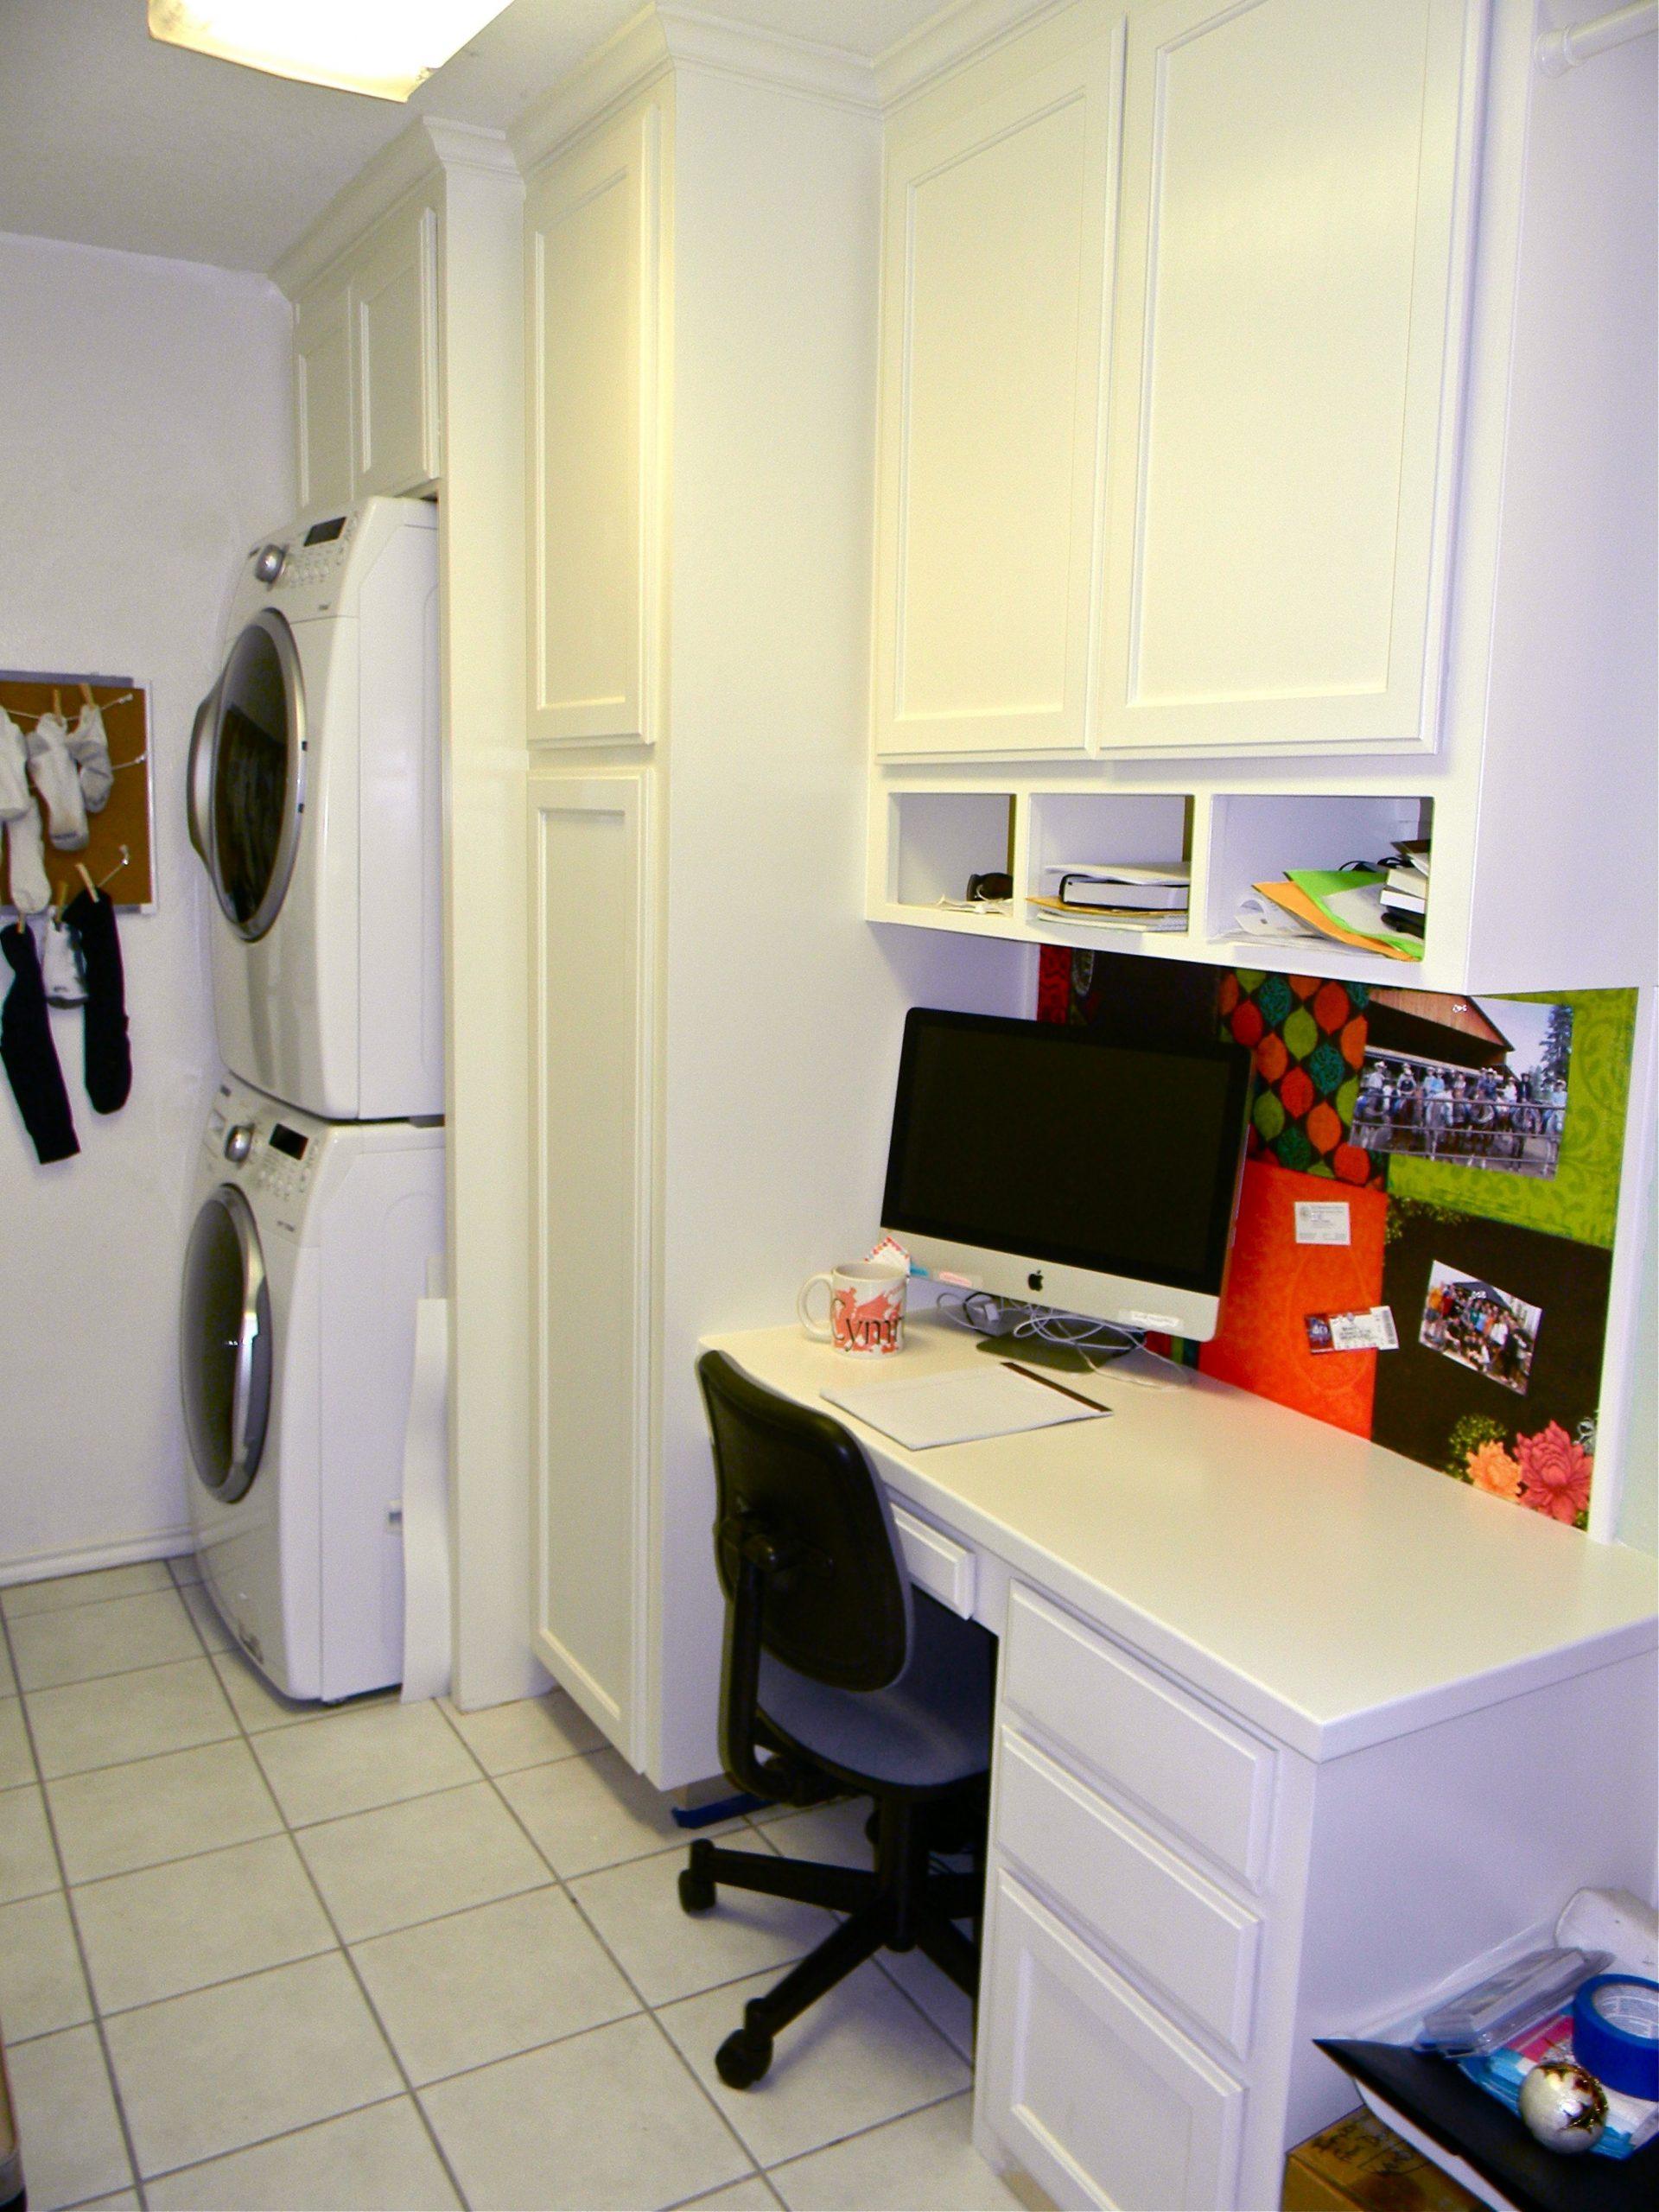 I converted my laundry room into a laundry room/office with built  - Laundry Room Office Ideas